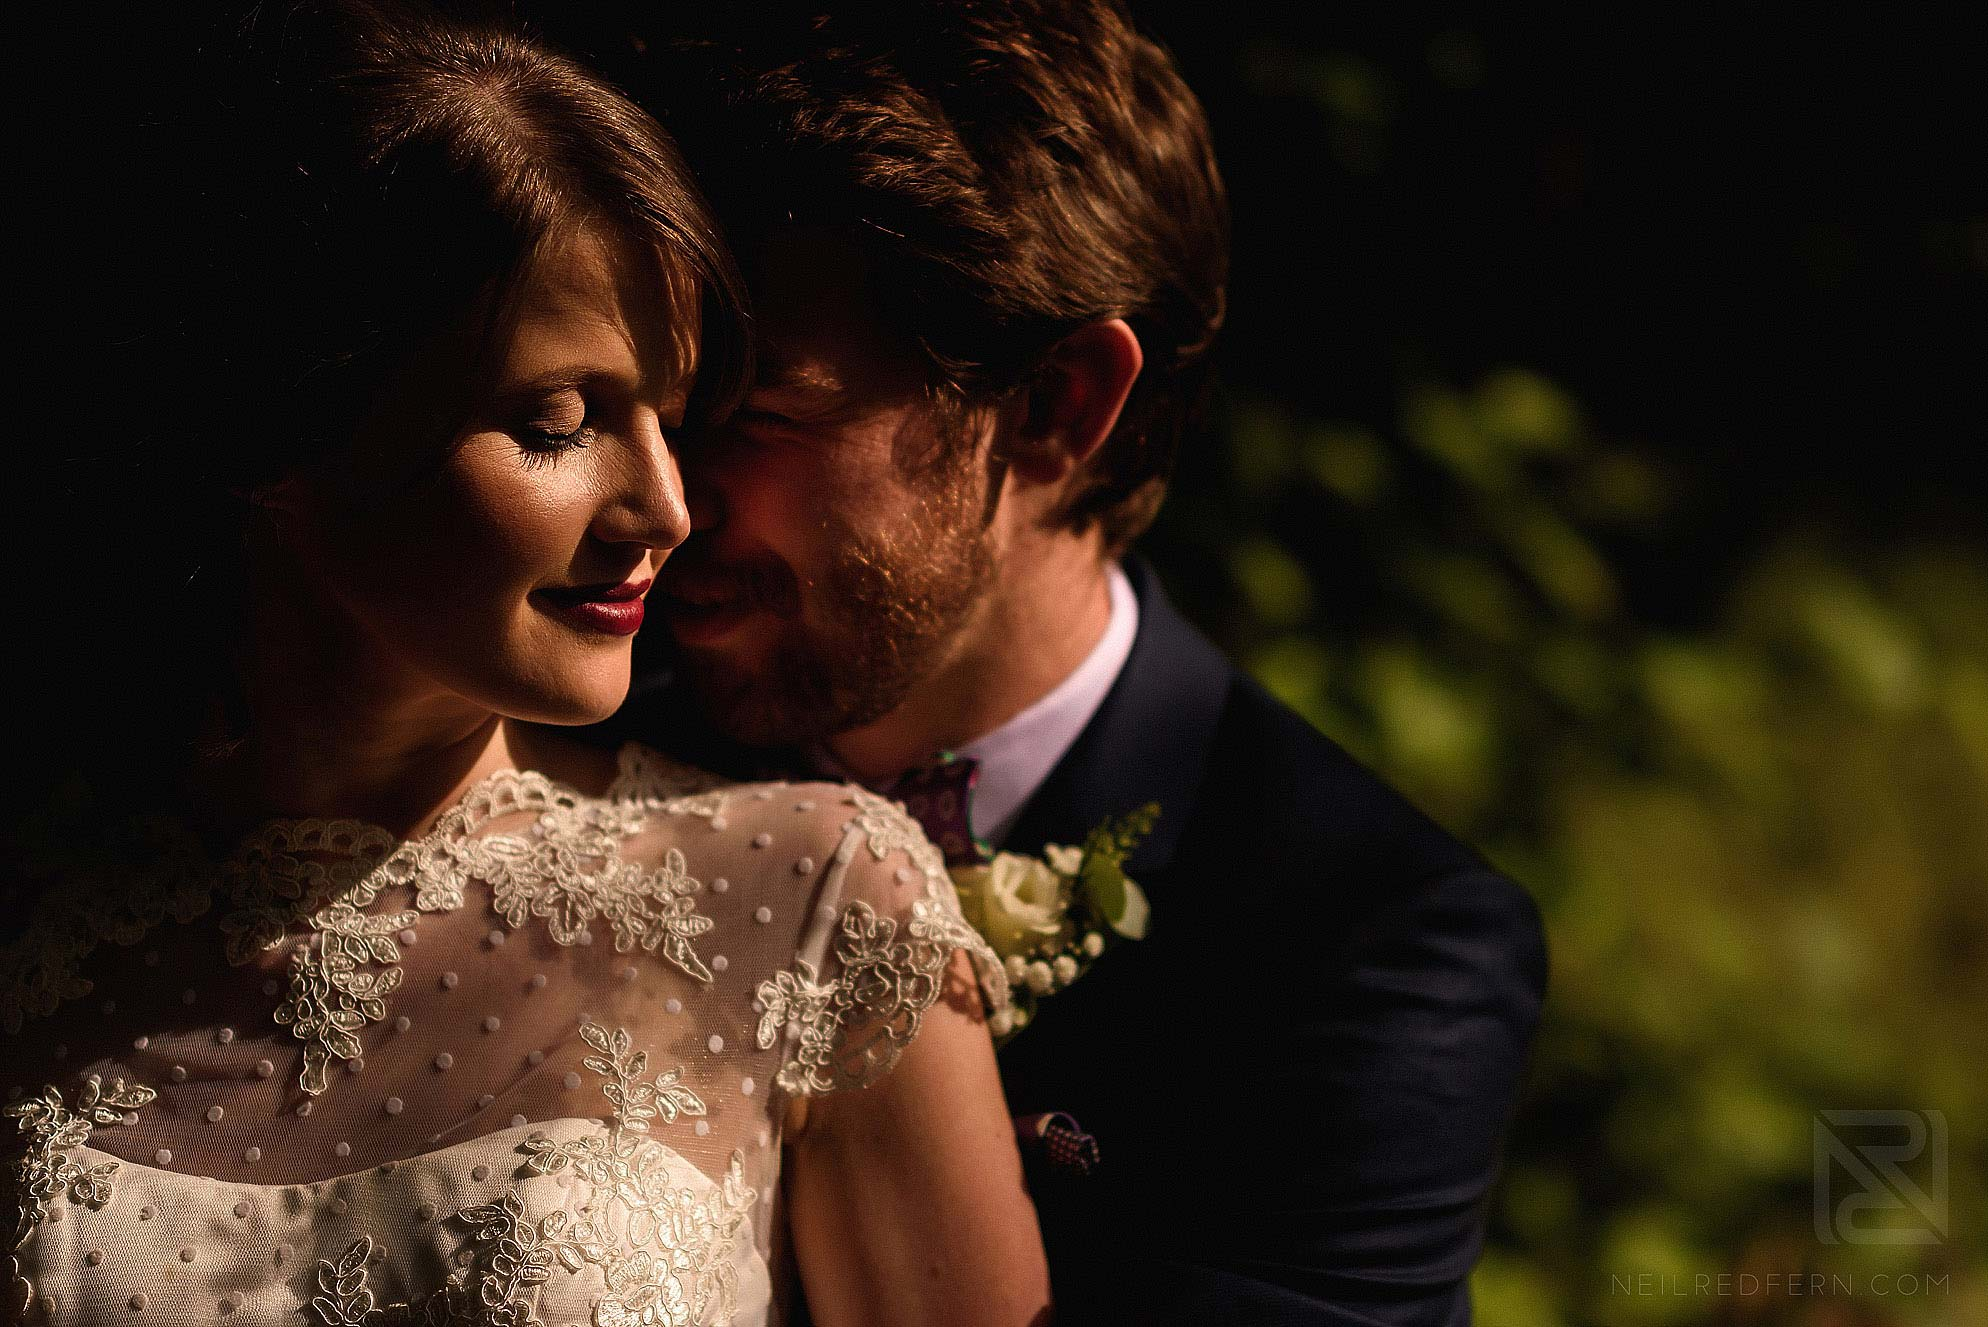 manchester-wedding-photography-workshop-01